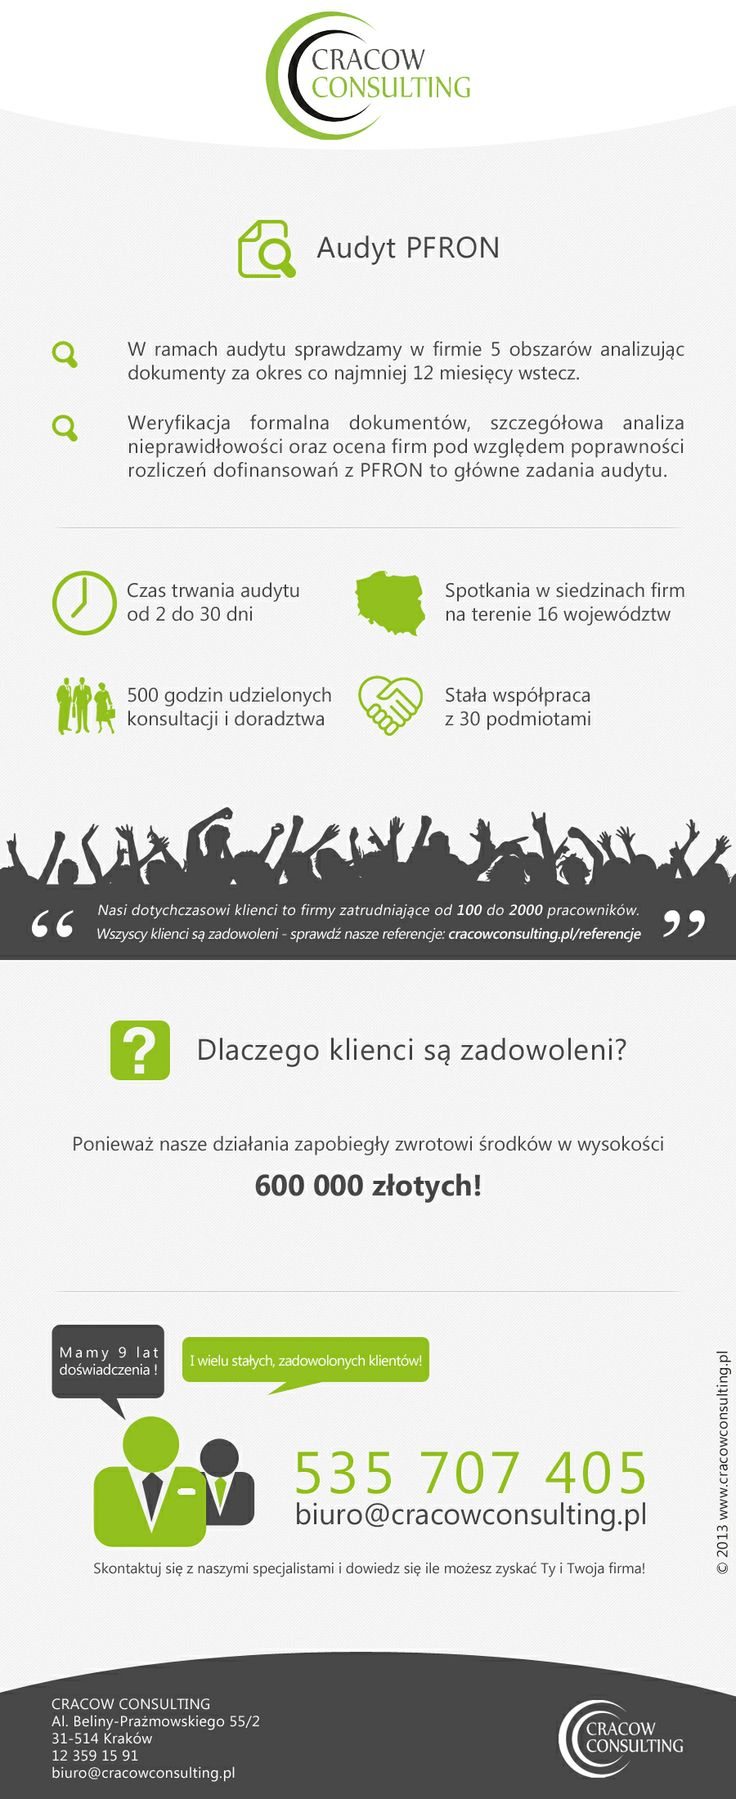 CracowConsulting - infografiki